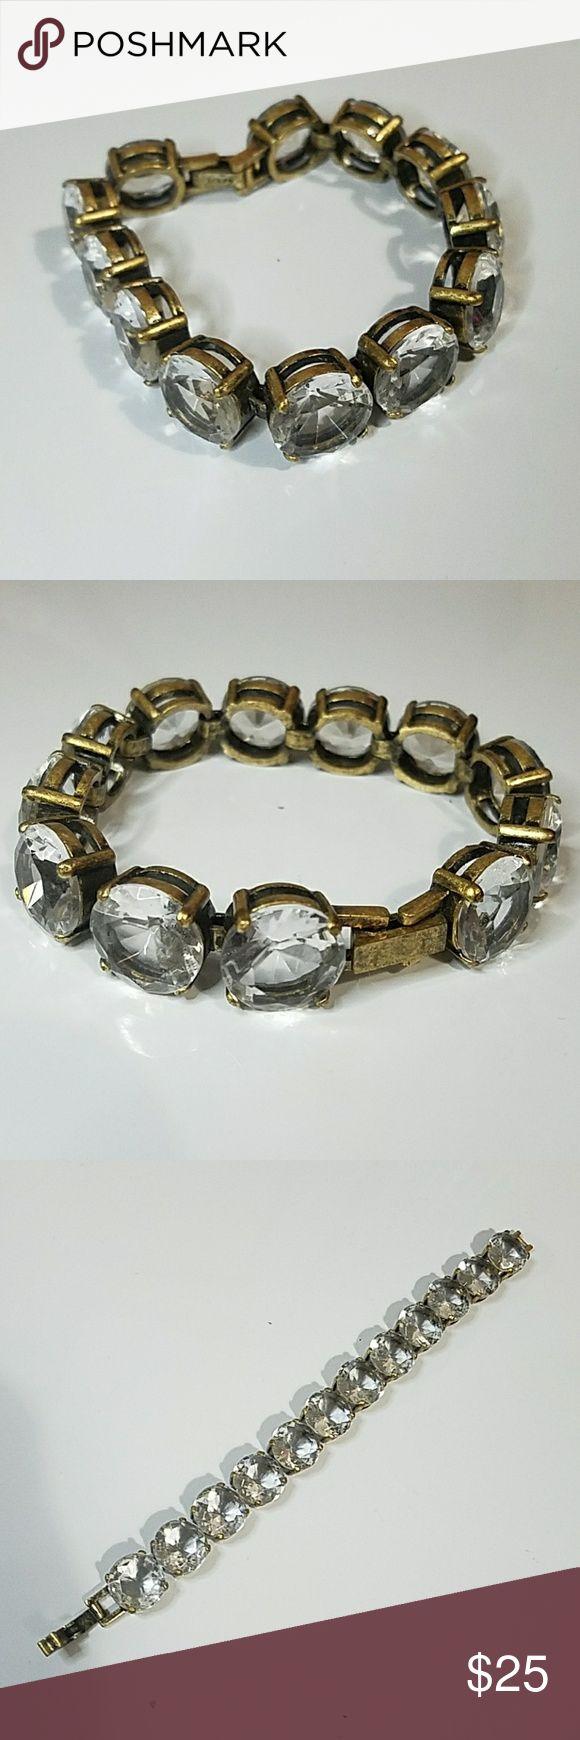 best 25+ j crew jewelry ideas on pinterest | j crew necklace, j